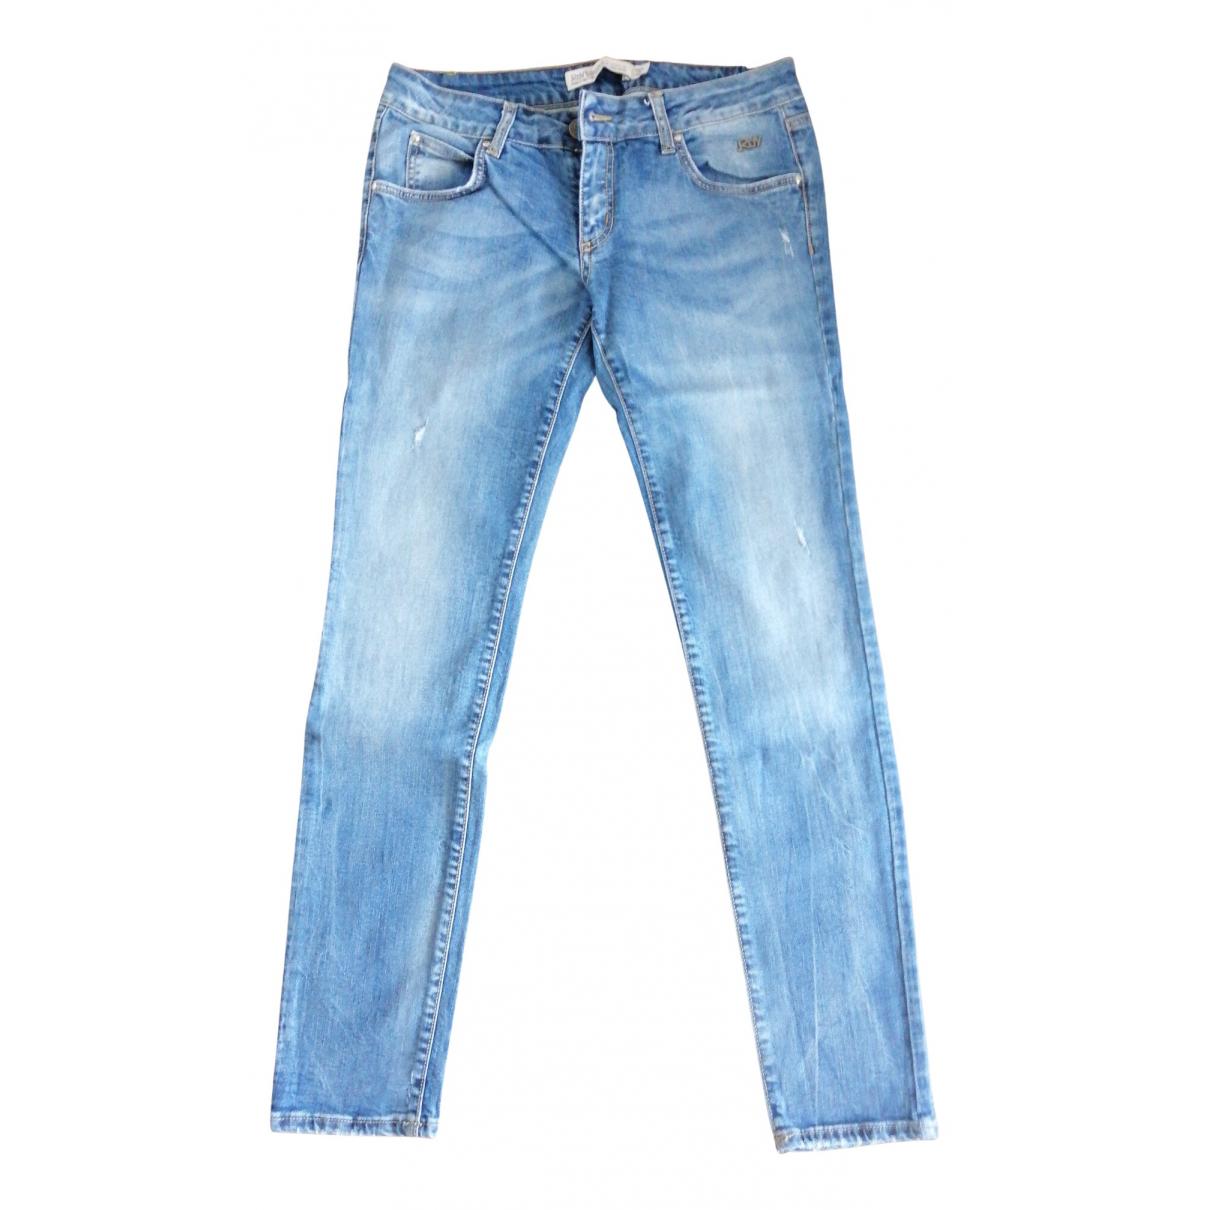 Roy Roger's N Blue Denim - Jeans Jeans for Women 29 US